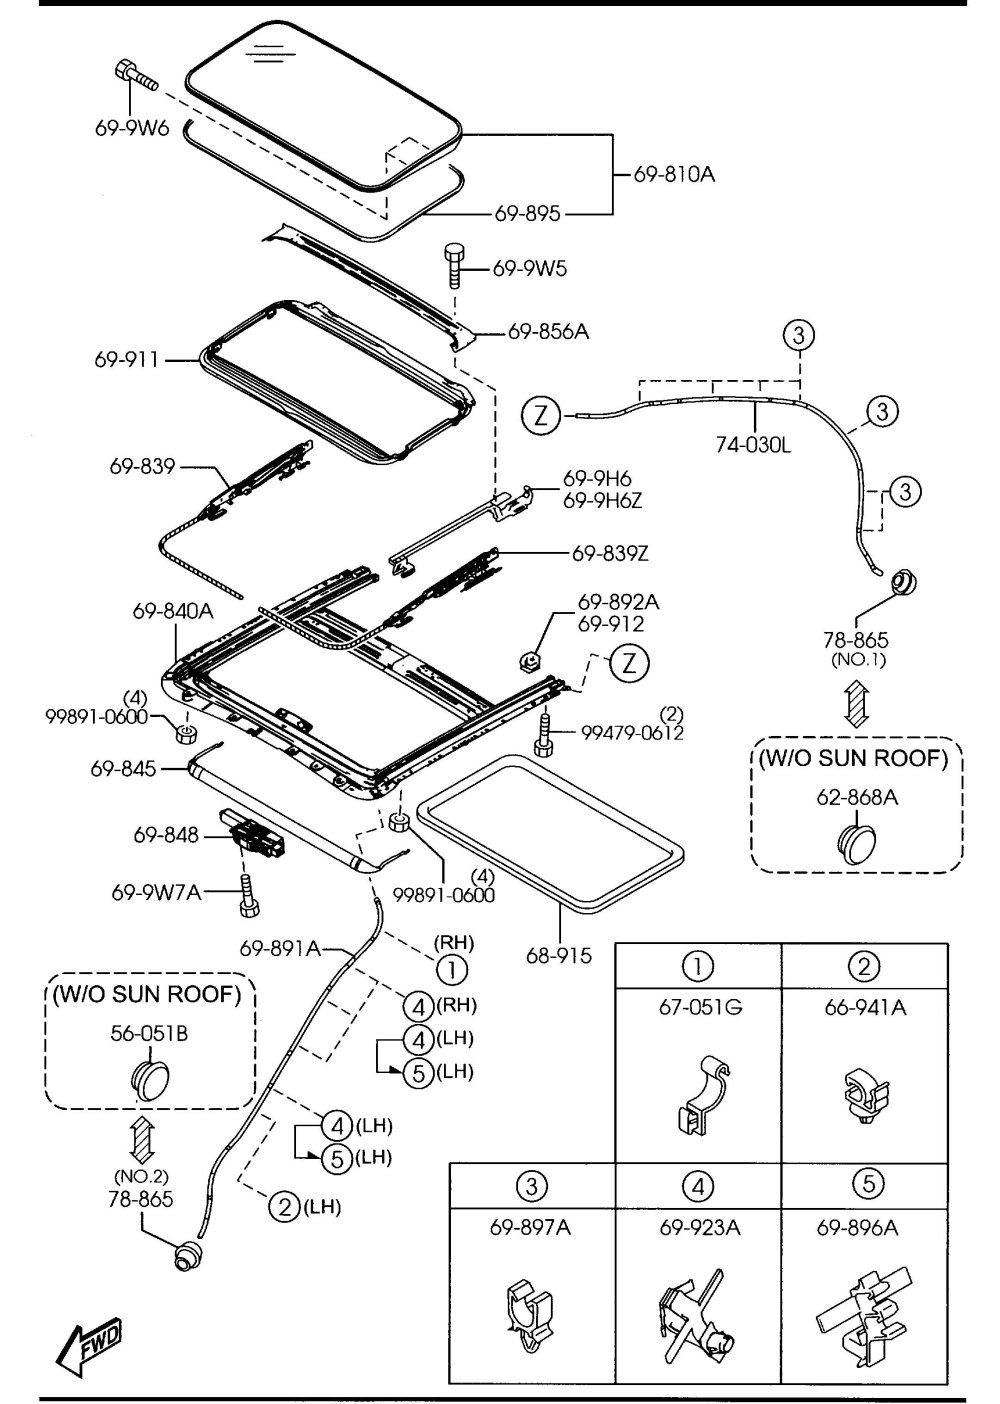 medium resolution of mazda 3 parts diagram wiring diagram for professional u2022 rh bestbreweries co 2005 ford taurus parts diagram 2005 ford taurus parts diagram